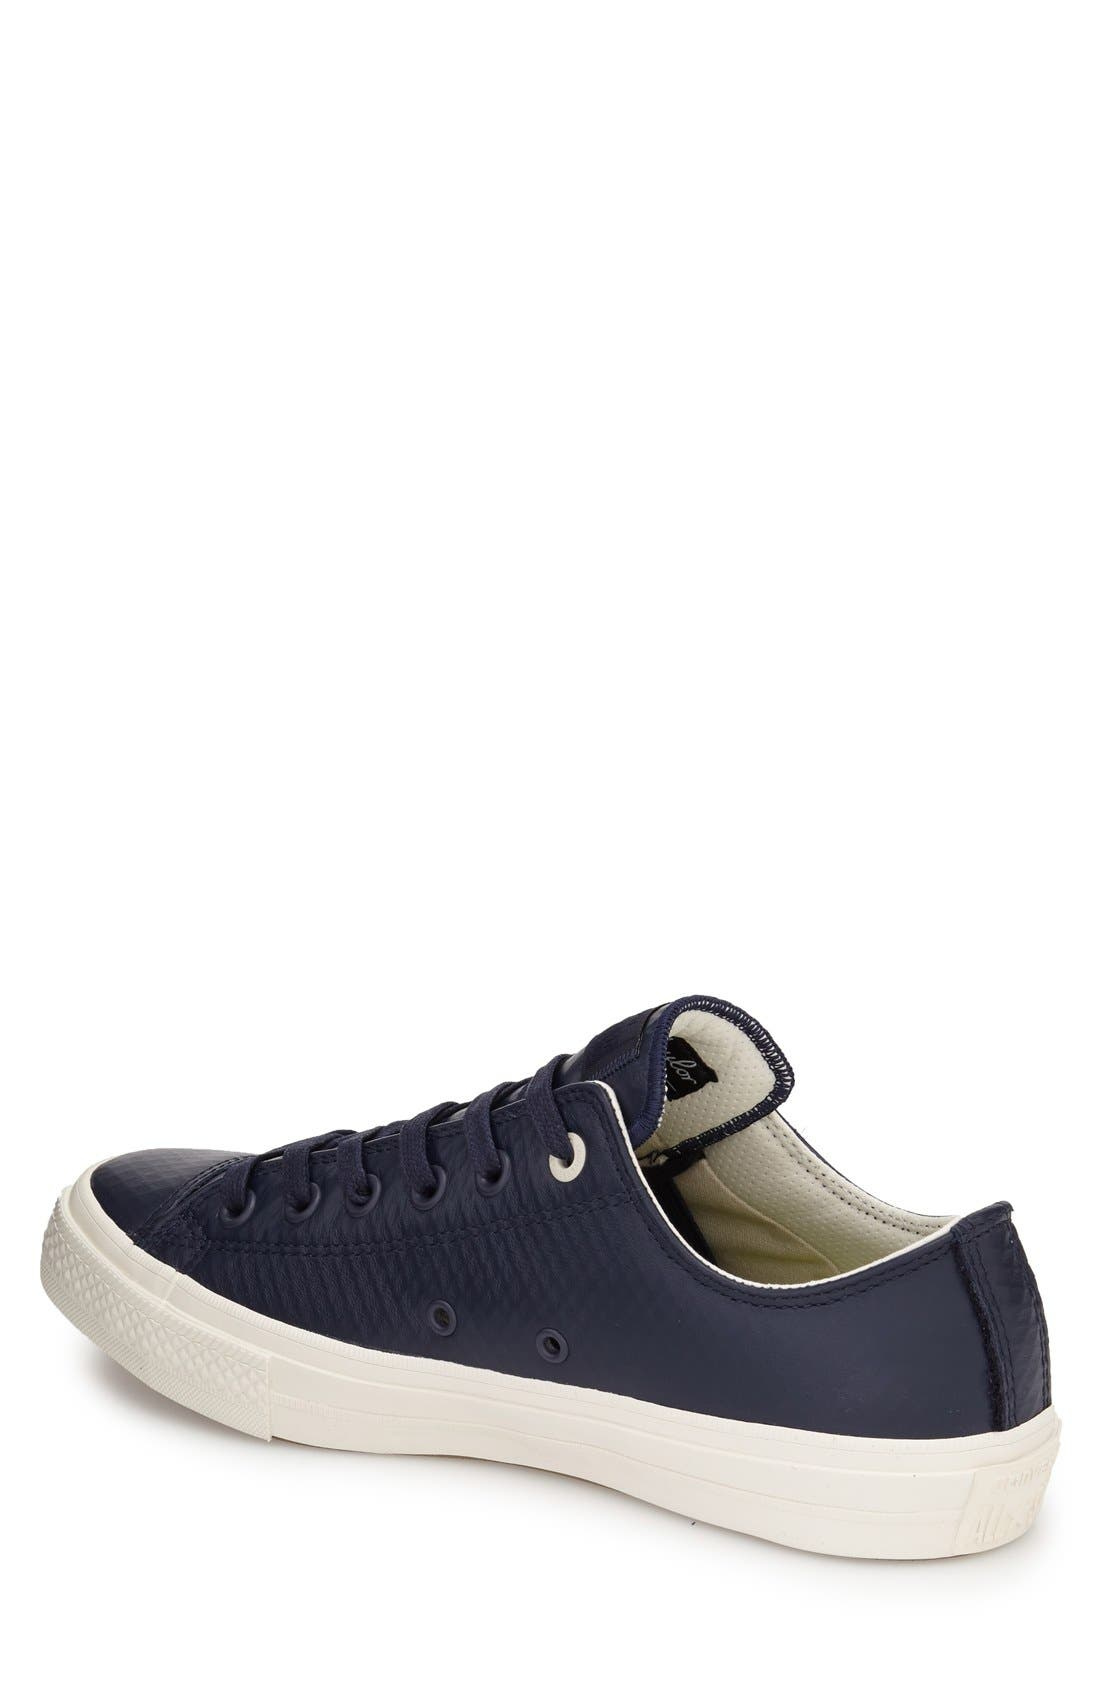 Alternate Image 2  - Converse Chuck Taylor® All Star® II Sneaker (Men)